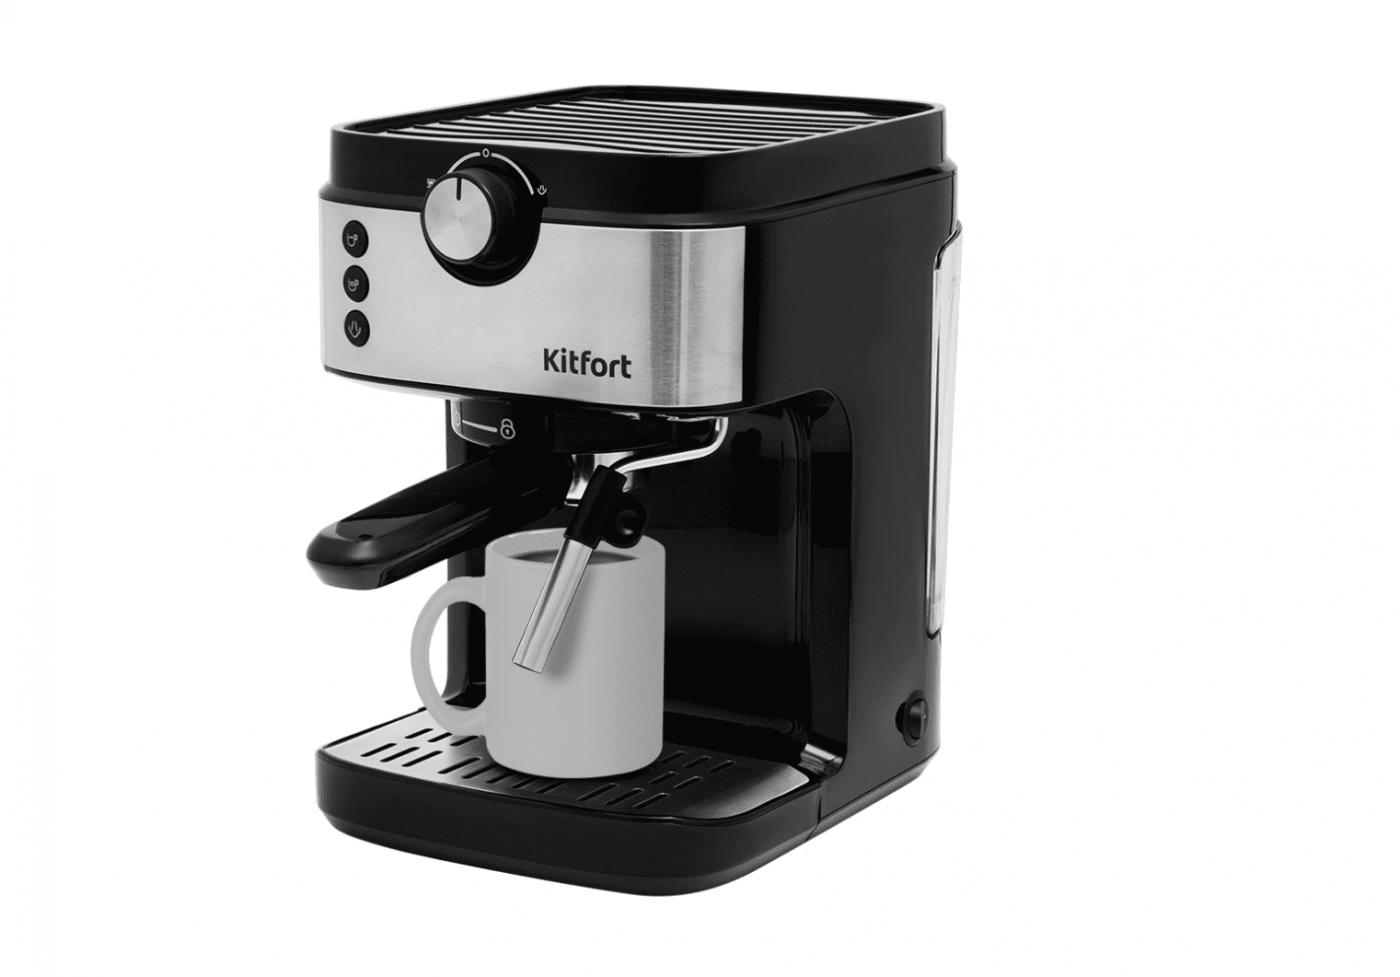 Кофеварка KitFort KT-742